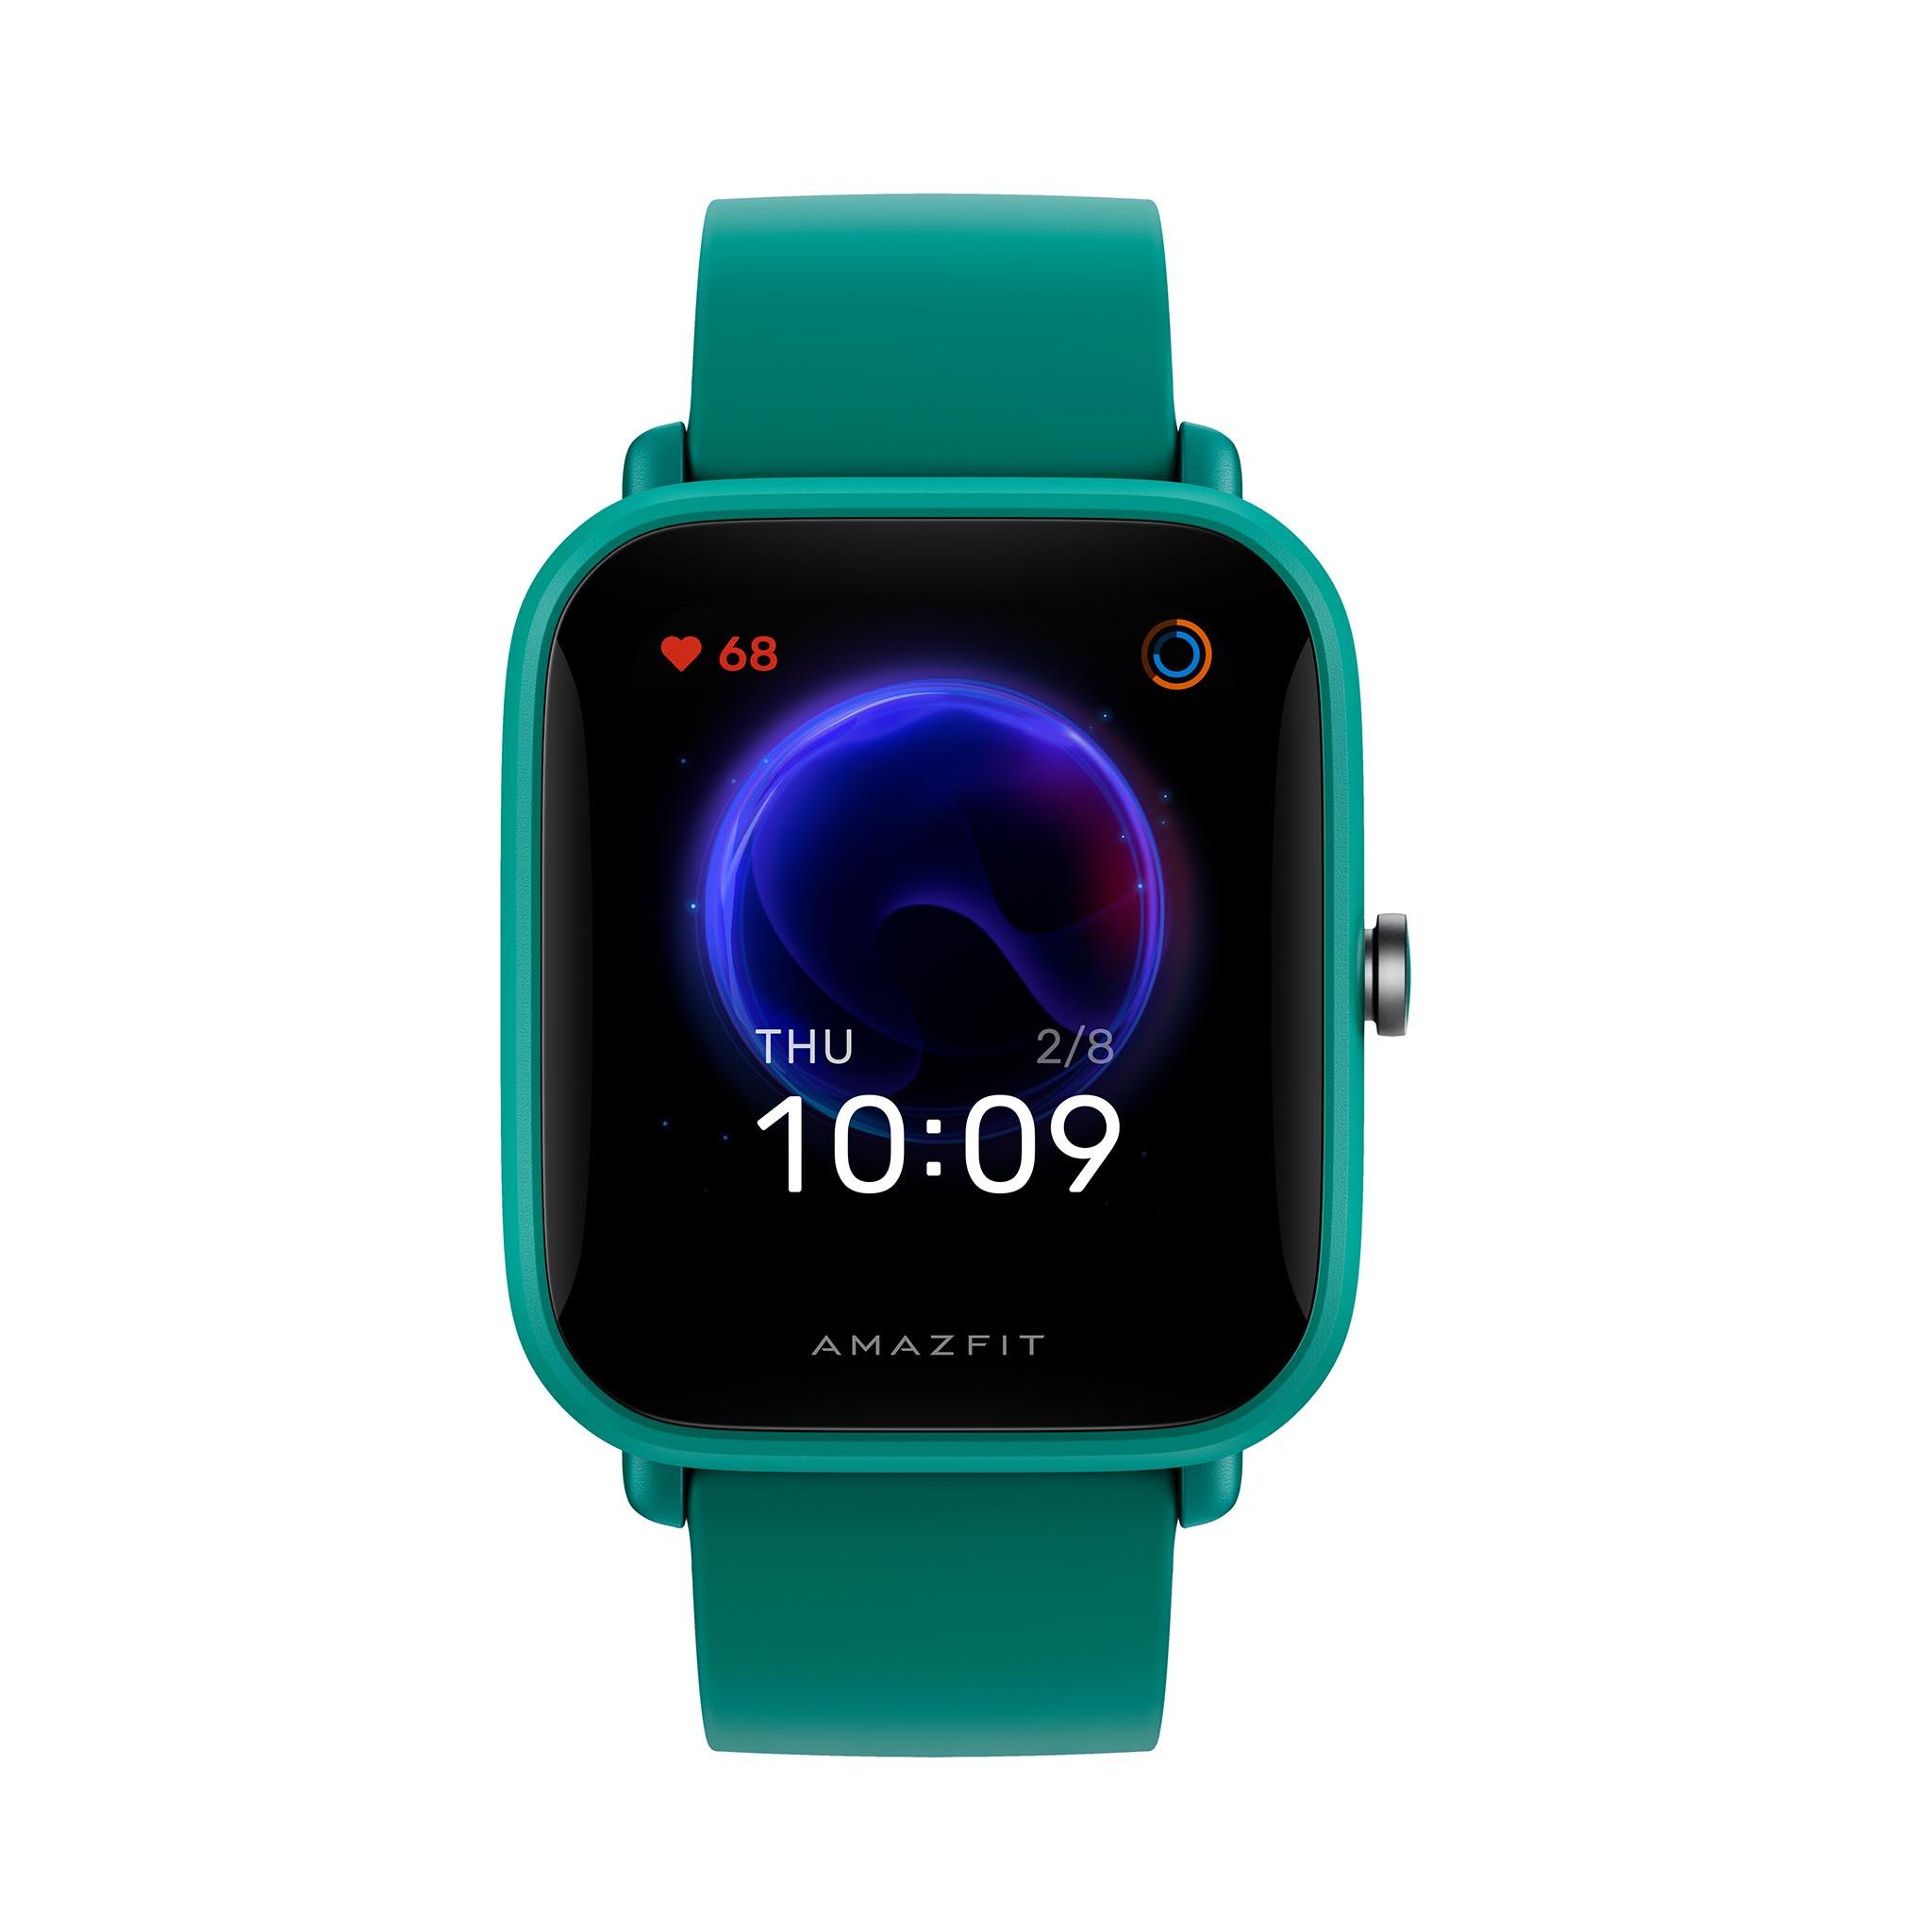 Image of Smartwatch AMAZFIT - Bip U Pro A2008 Green